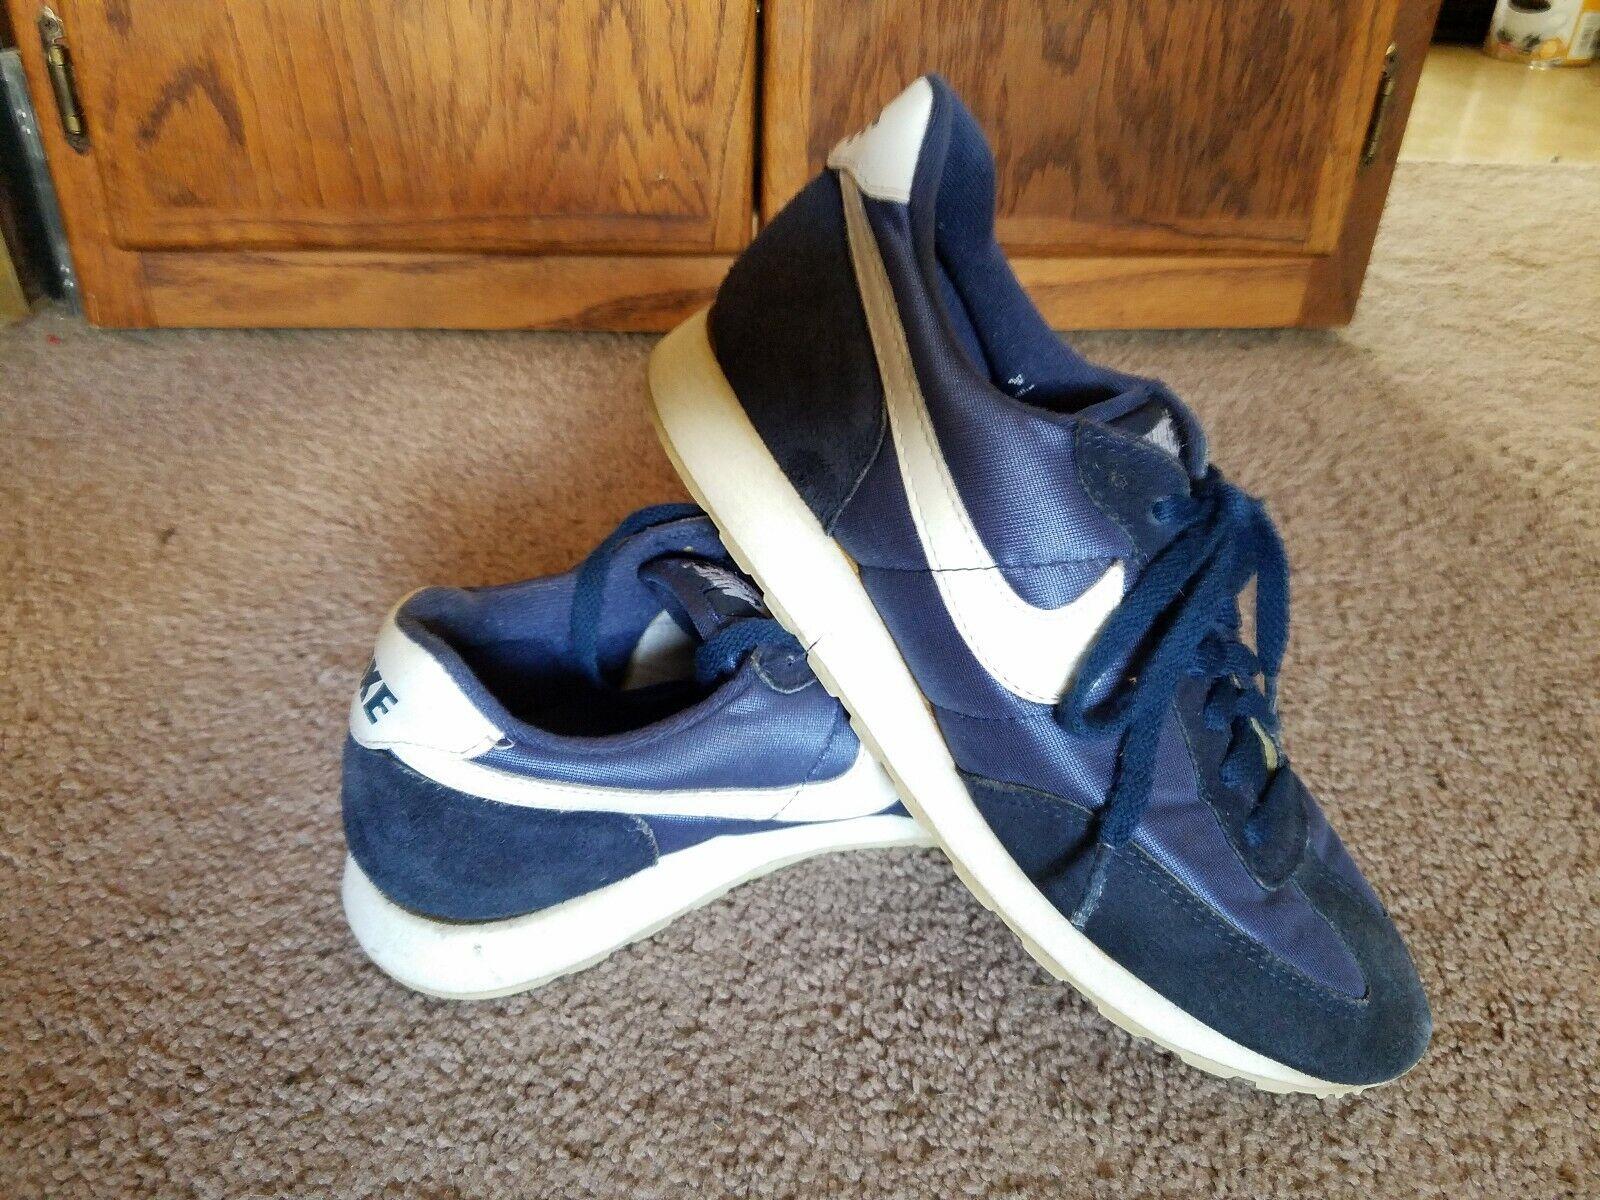 Vintage Nike Sneakers Sports shoesSuede & Nylonbluee White1980sMens 7 1 2 7.5